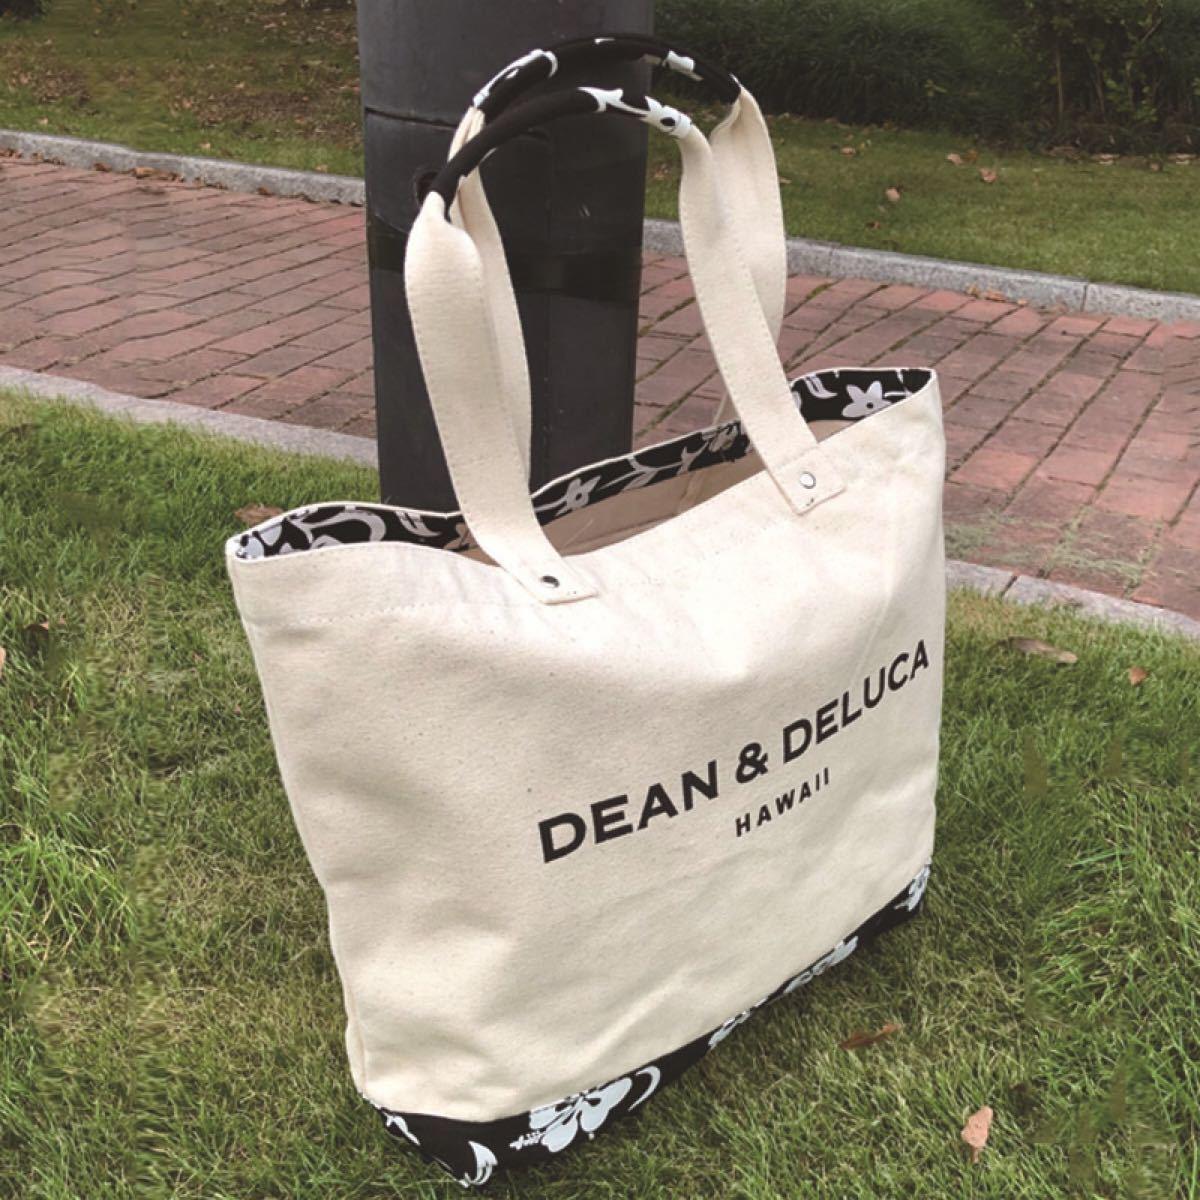 DEAN&DELUCA☆ハンドバッグ☆エコバッグ☆ハイビスカス☆花柄☆ハワイ☆トートバッグ